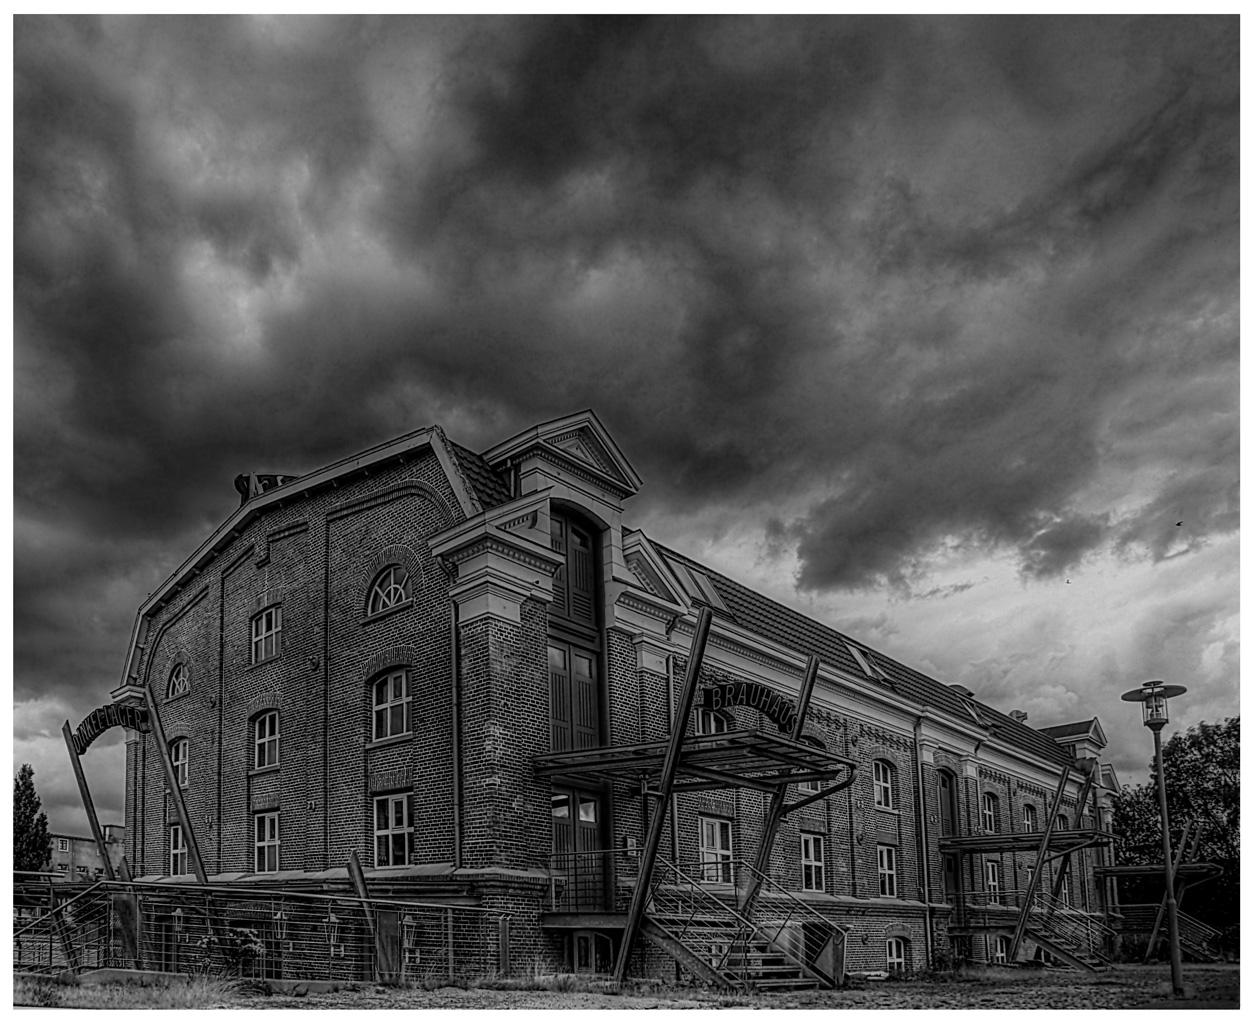 Industriedenkmal im Regen